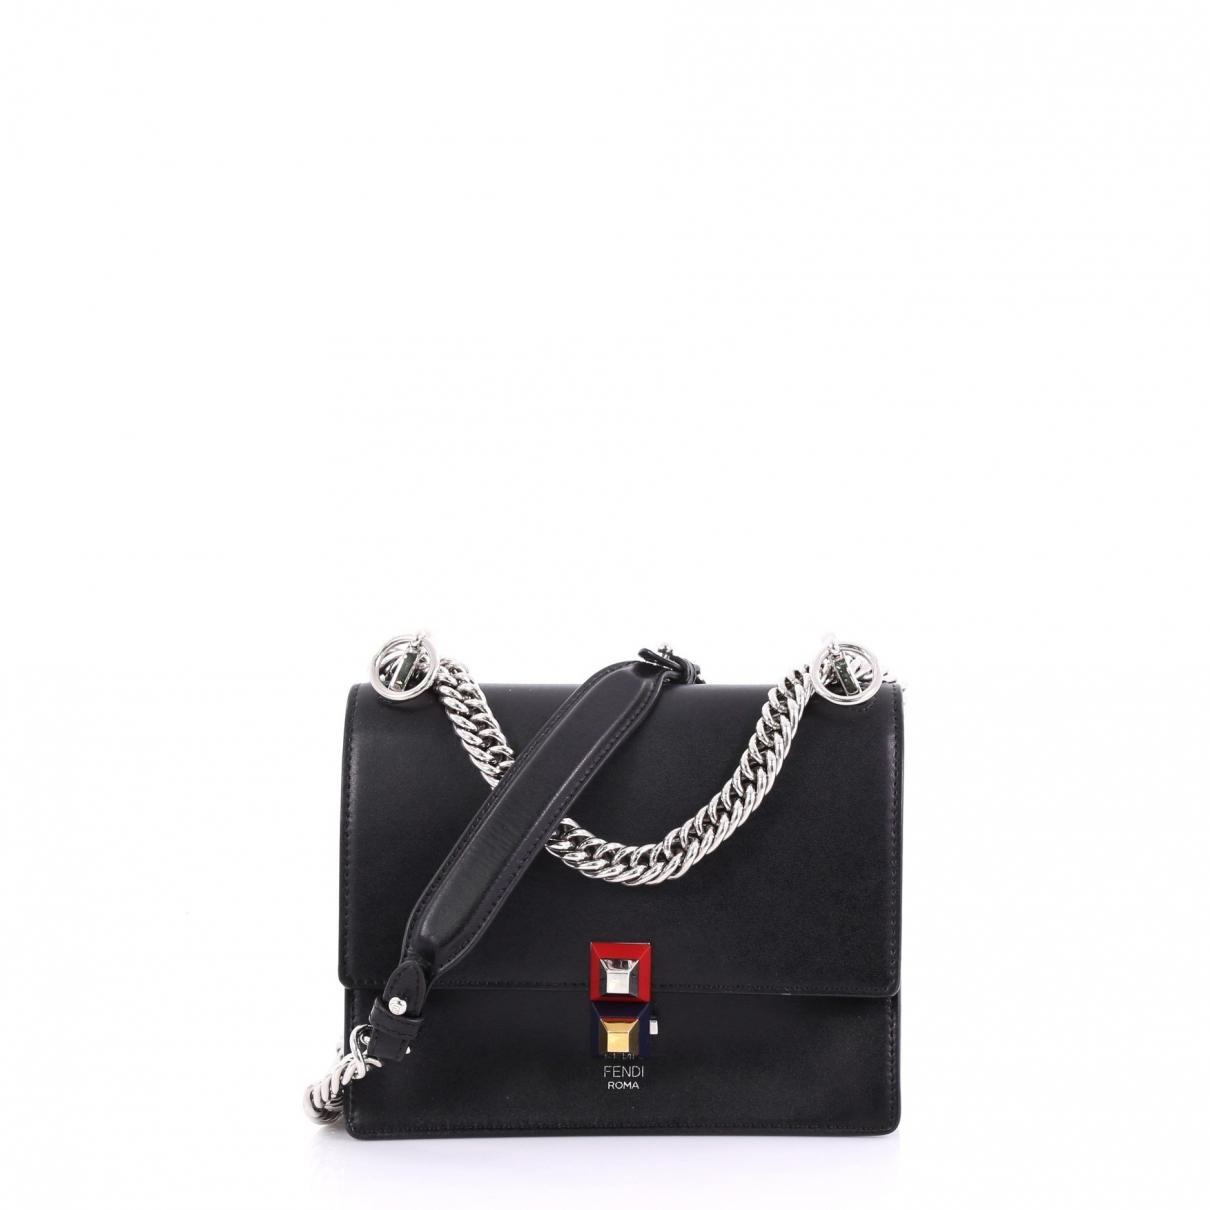 f568fc0d98 Lyst - Fendi Pre-owned Kan I Black Leather Handbags in Black